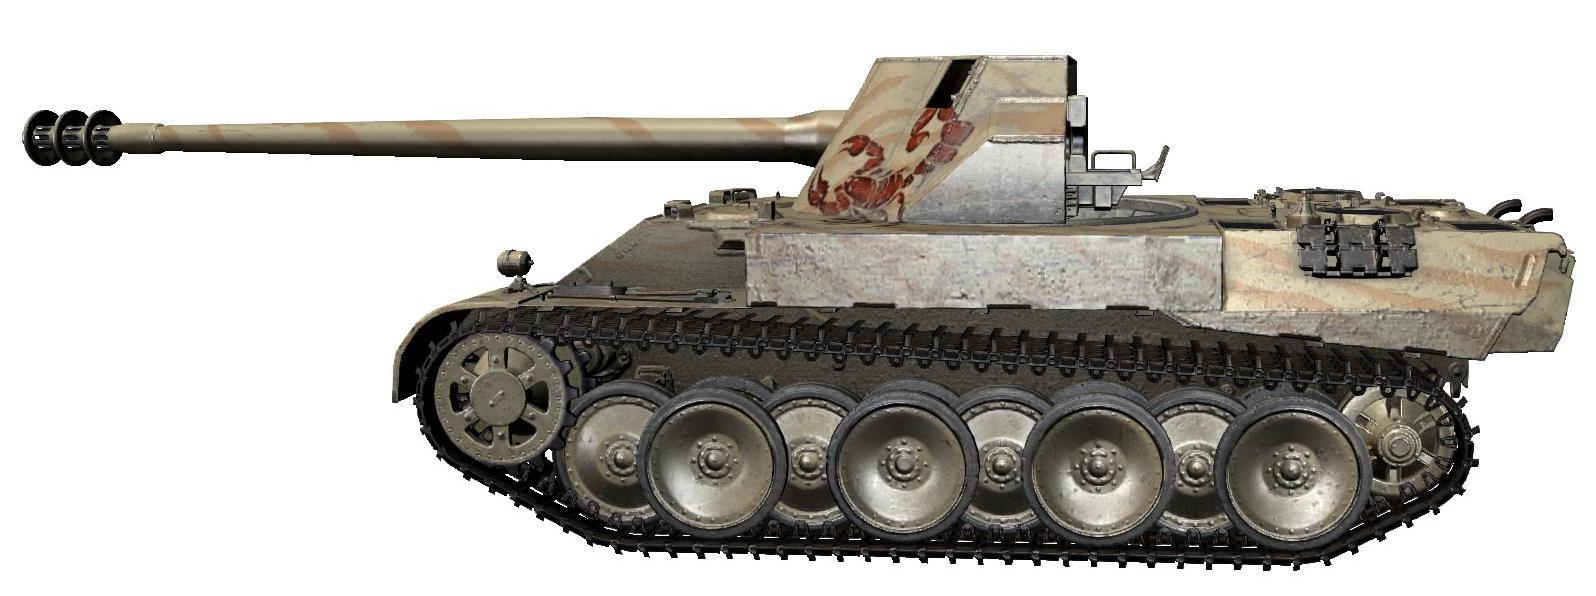 Rheinmetall-Skorpion